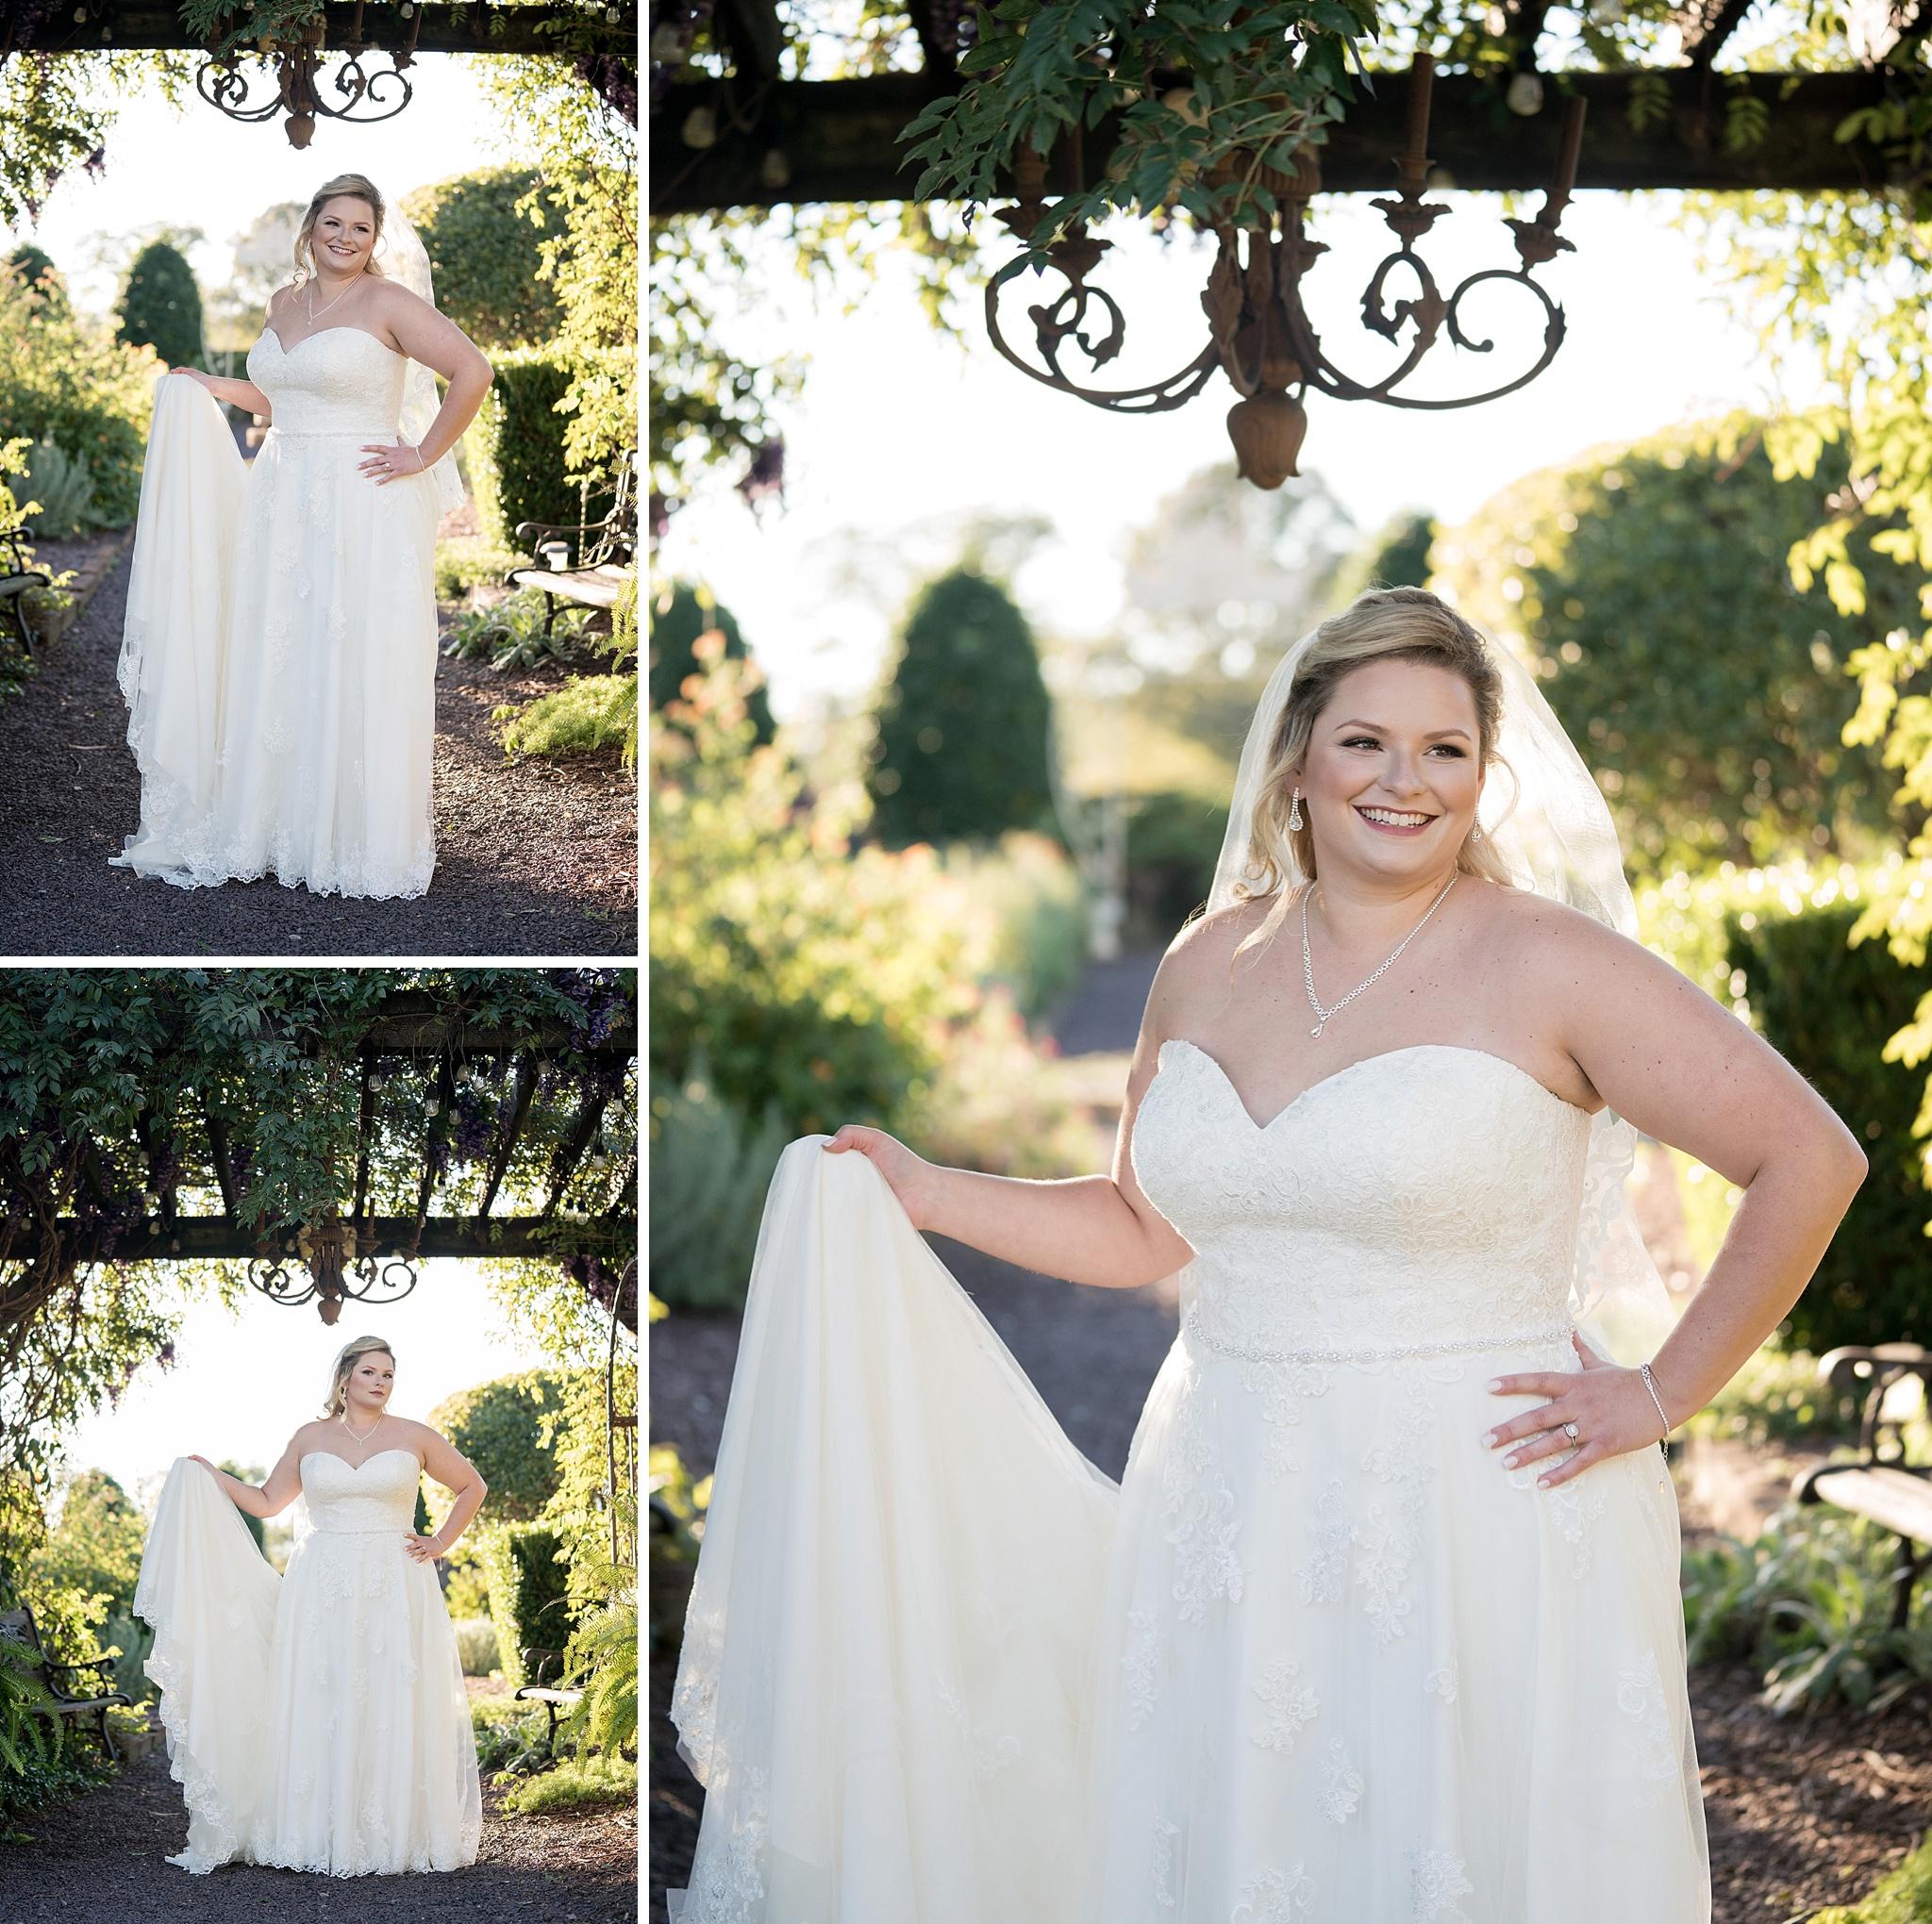 Little-Herb-House-Wedding-Photographer-060.jpg